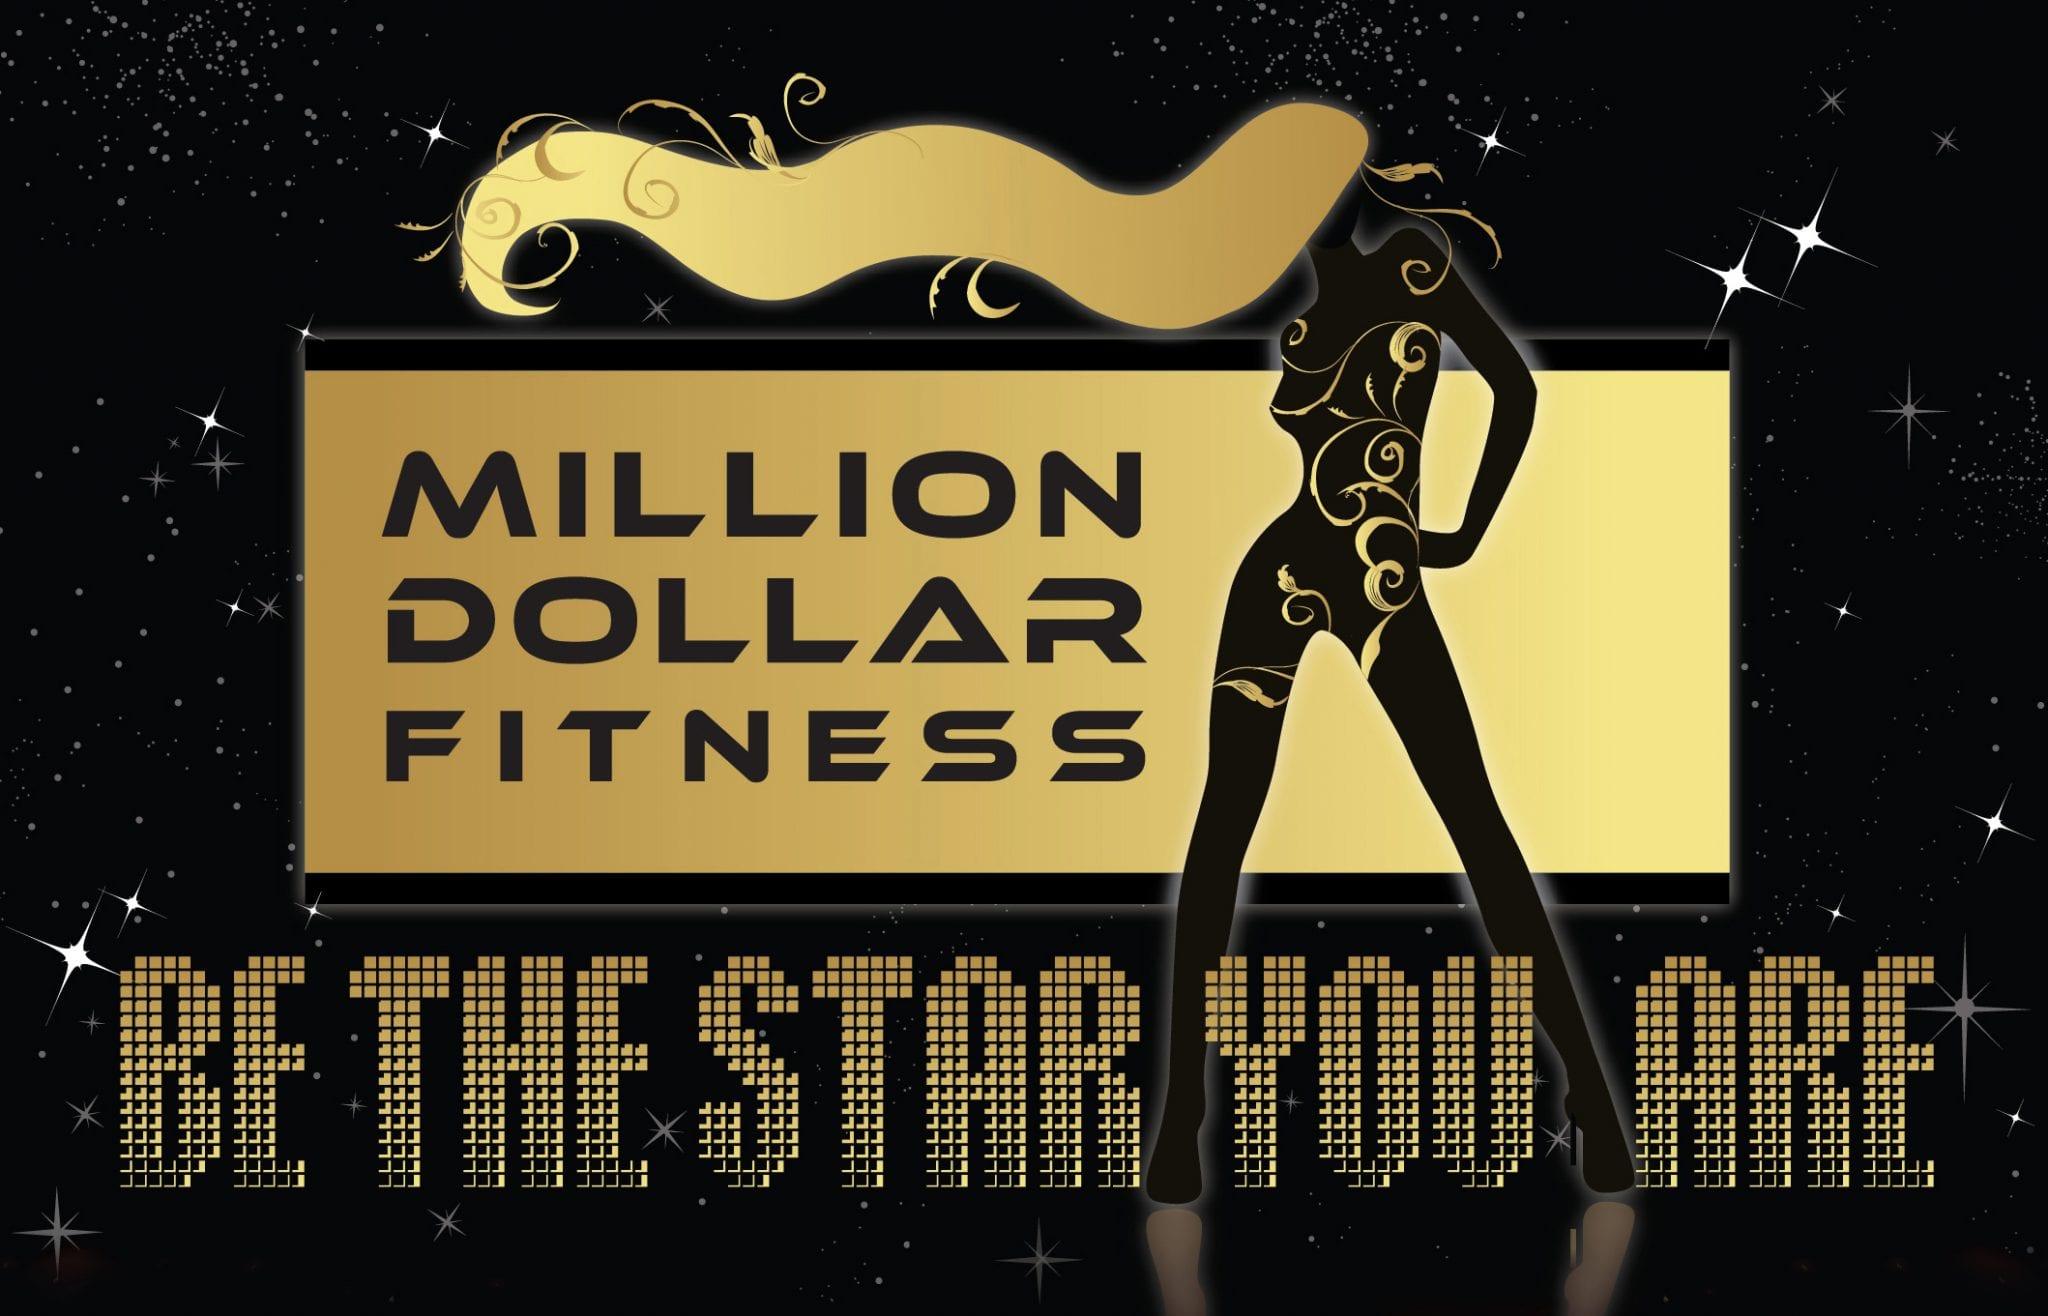 Million Dollar Fitness logo